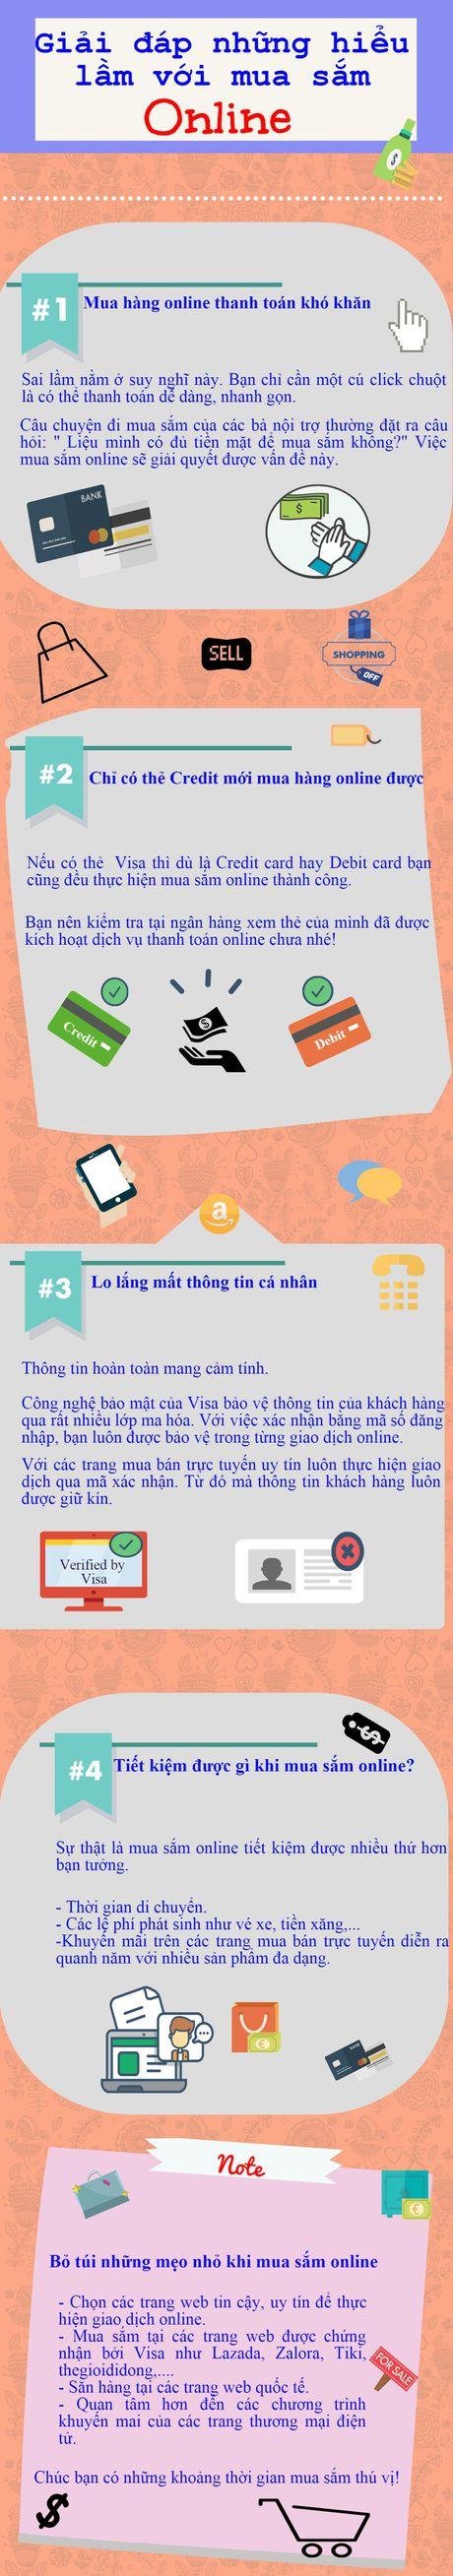 Gat bo nhung lam tuong khi mua sam online - Anh 1